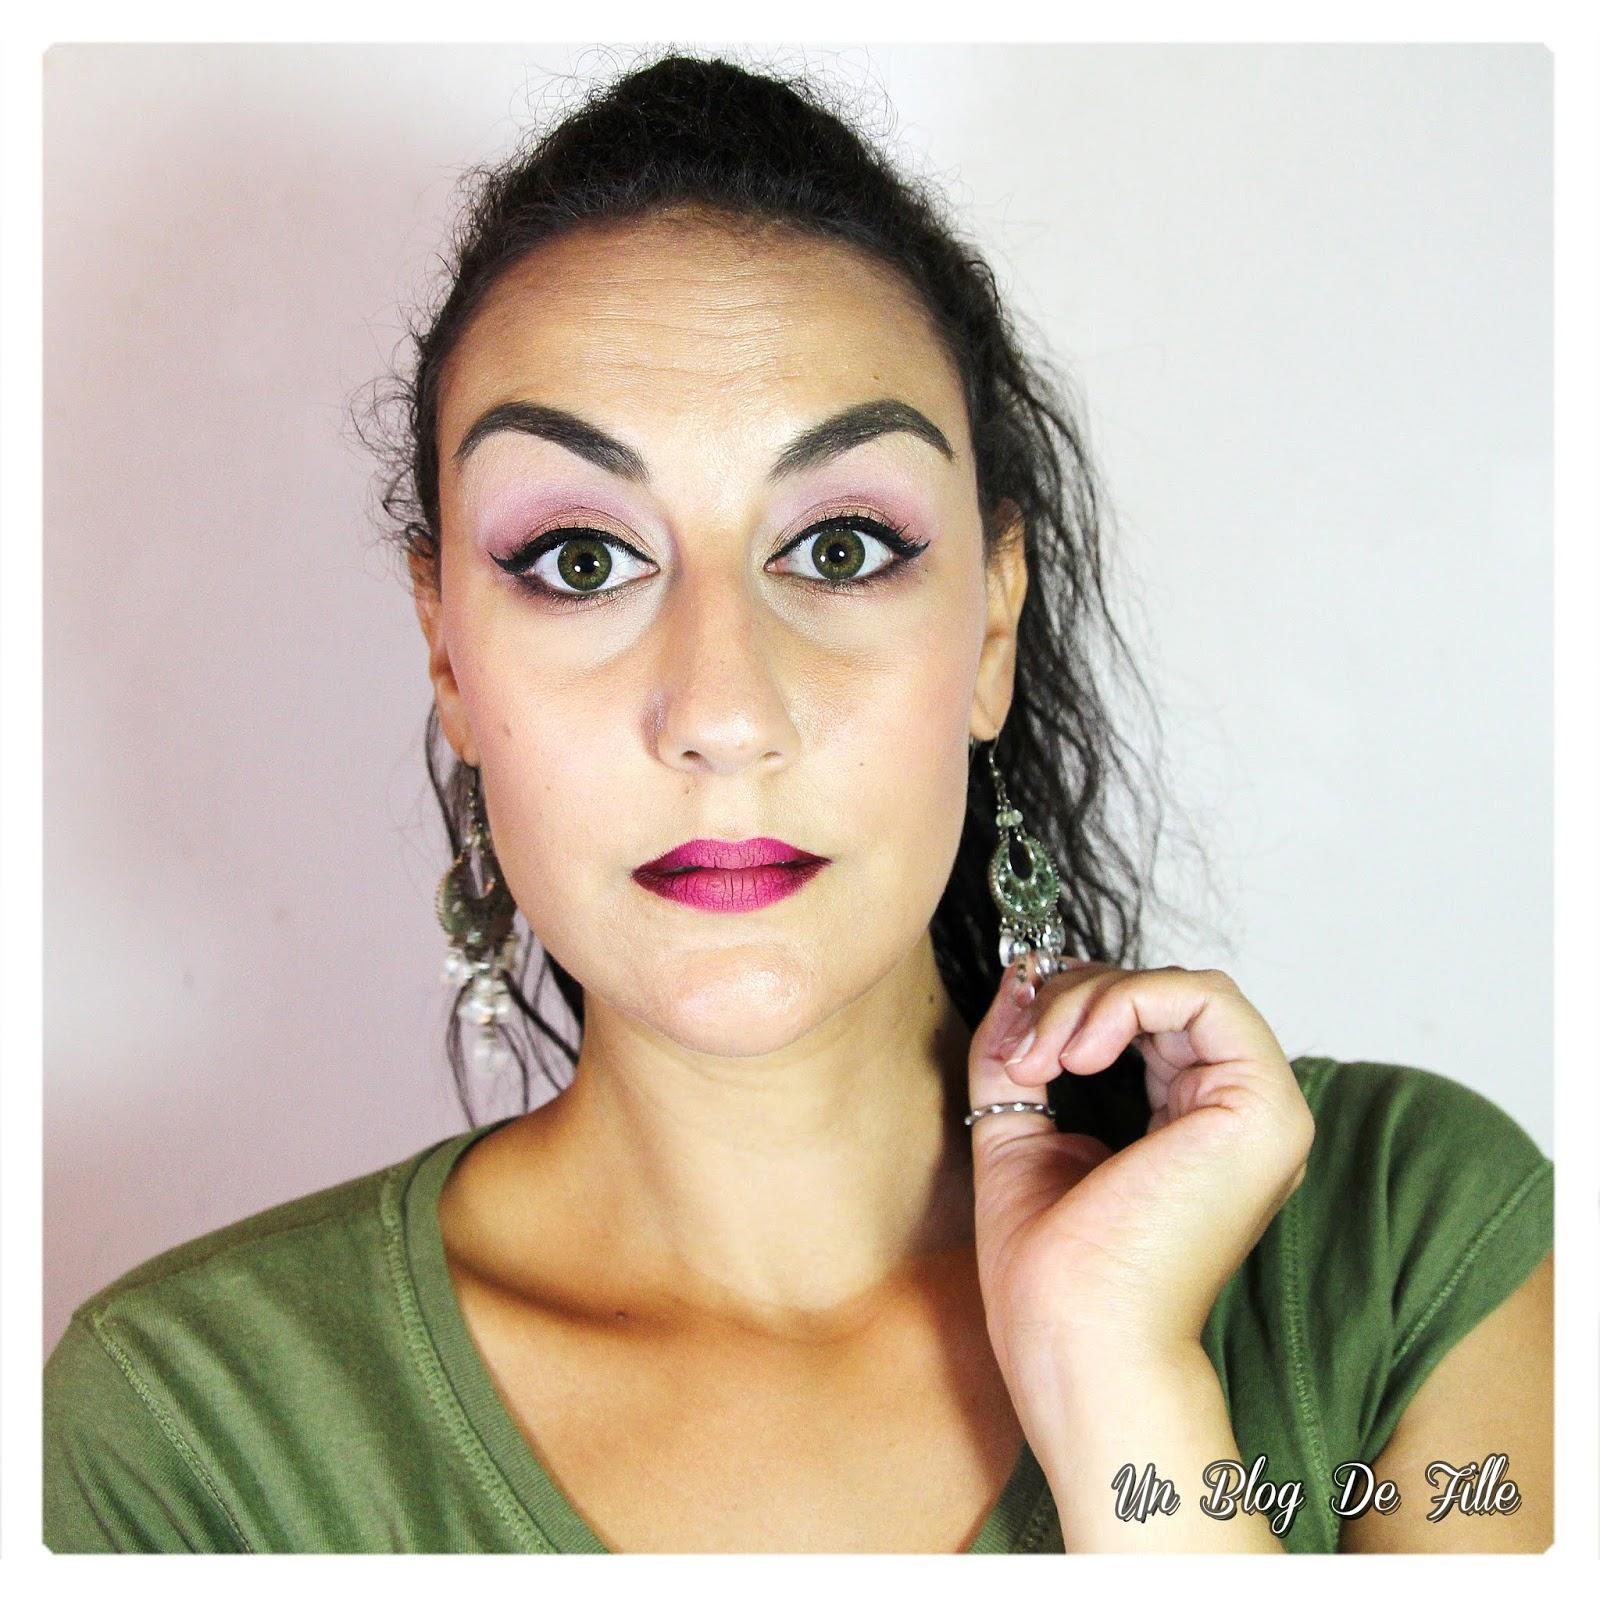 http://www.unblogdefille.fr/2018/09/maquillage-nuances-de-rose-msc-marsala.html